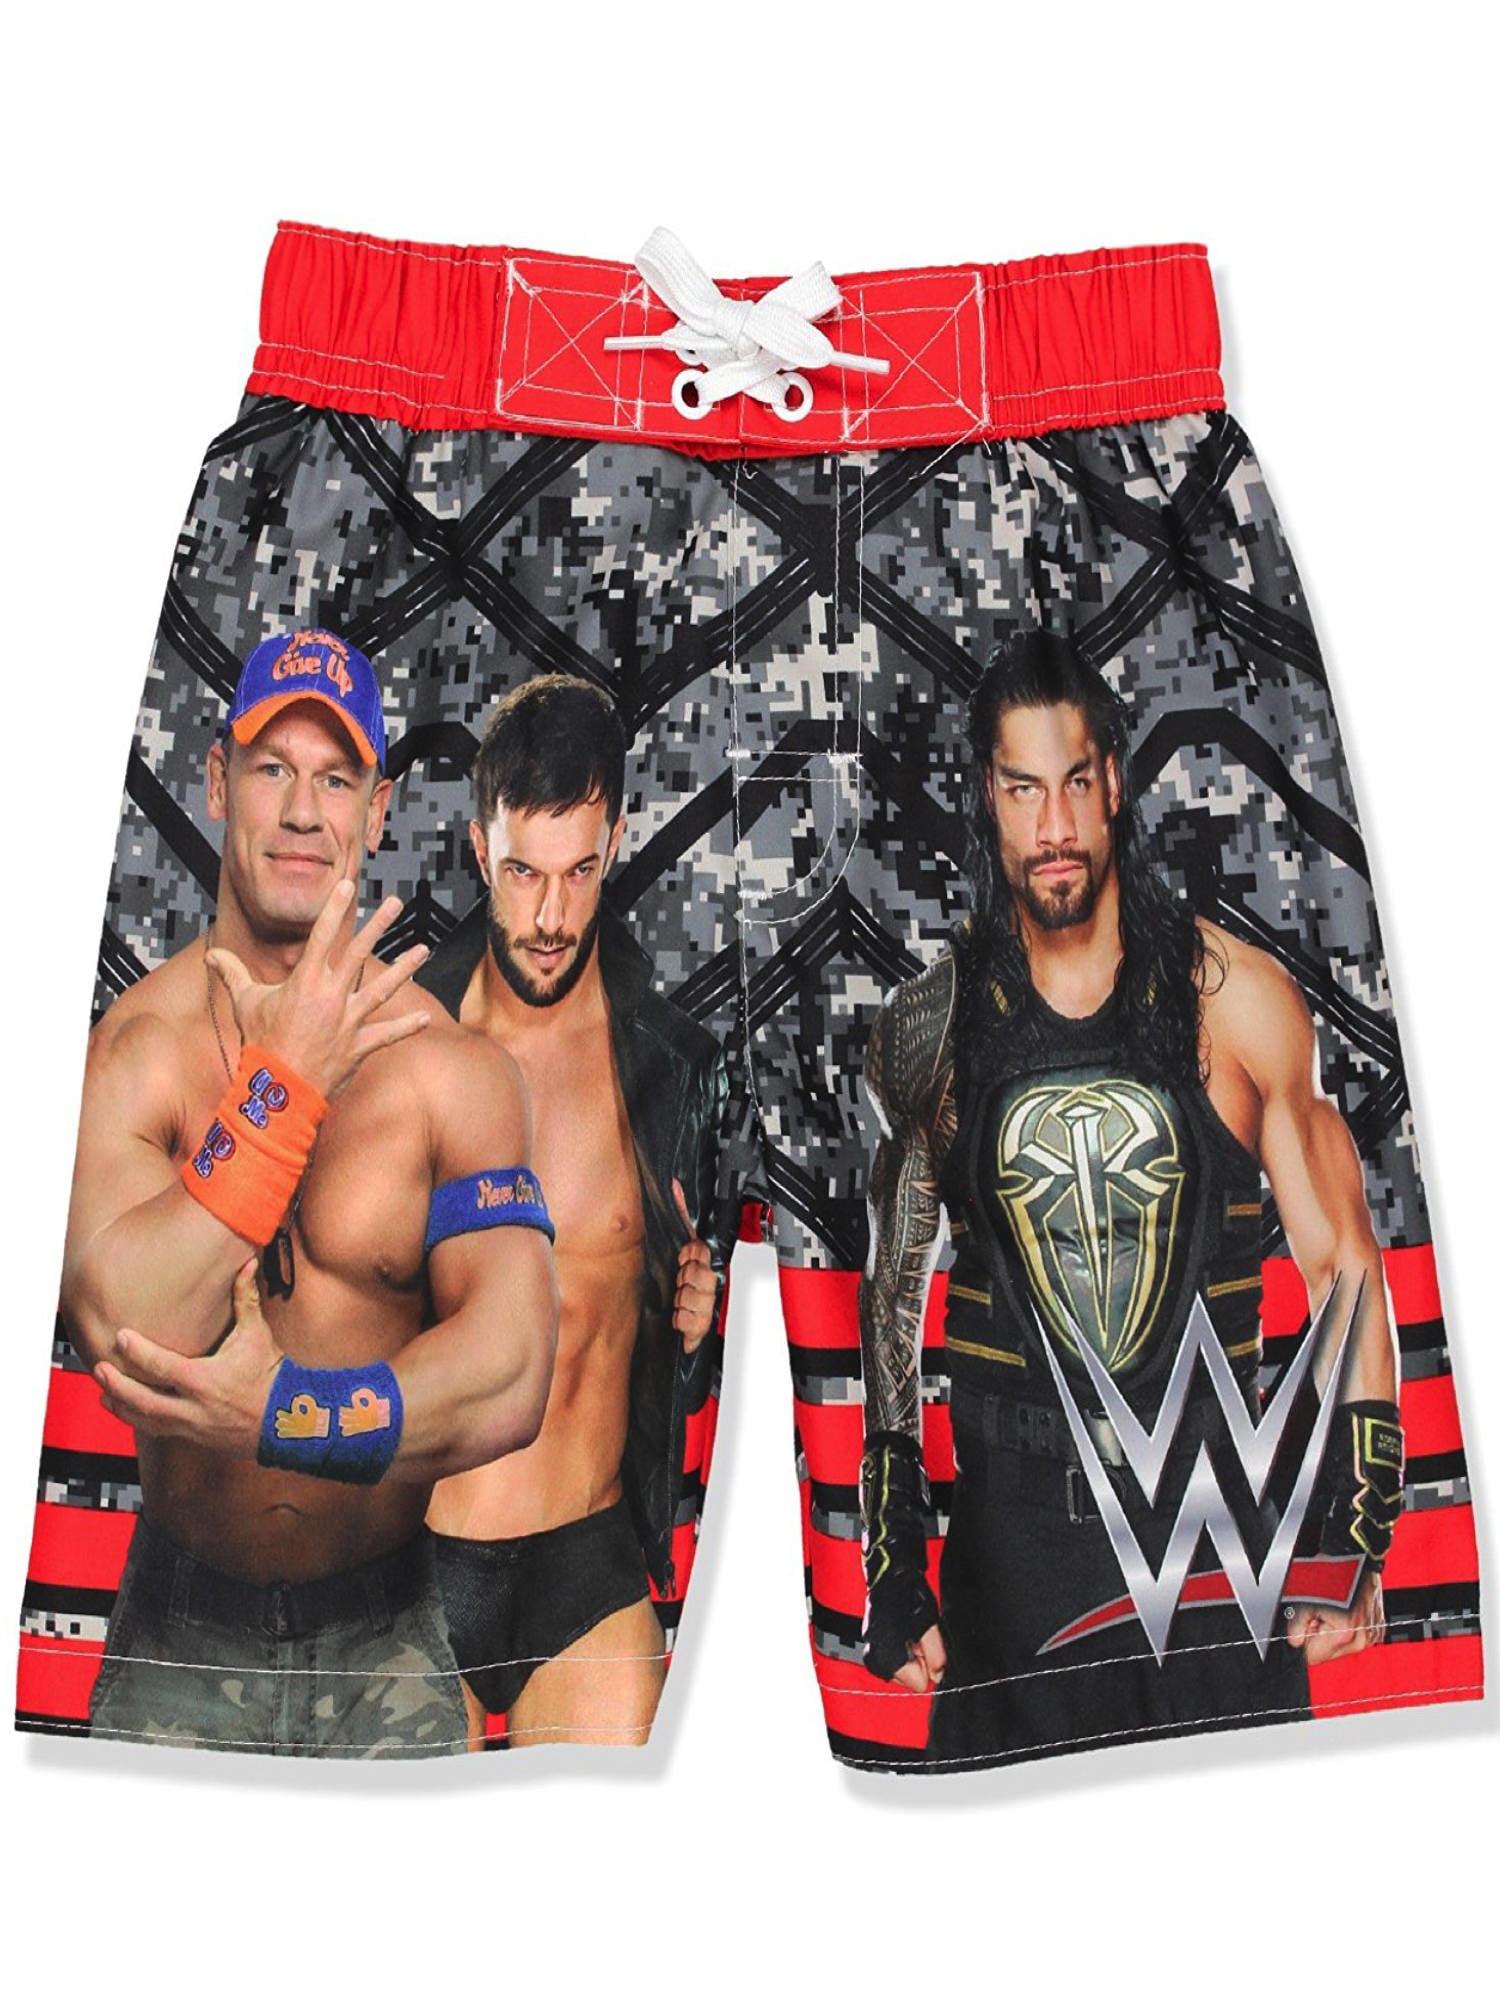 WWE Little and Big Boys Swim Trunks Swimwear, Black/Red